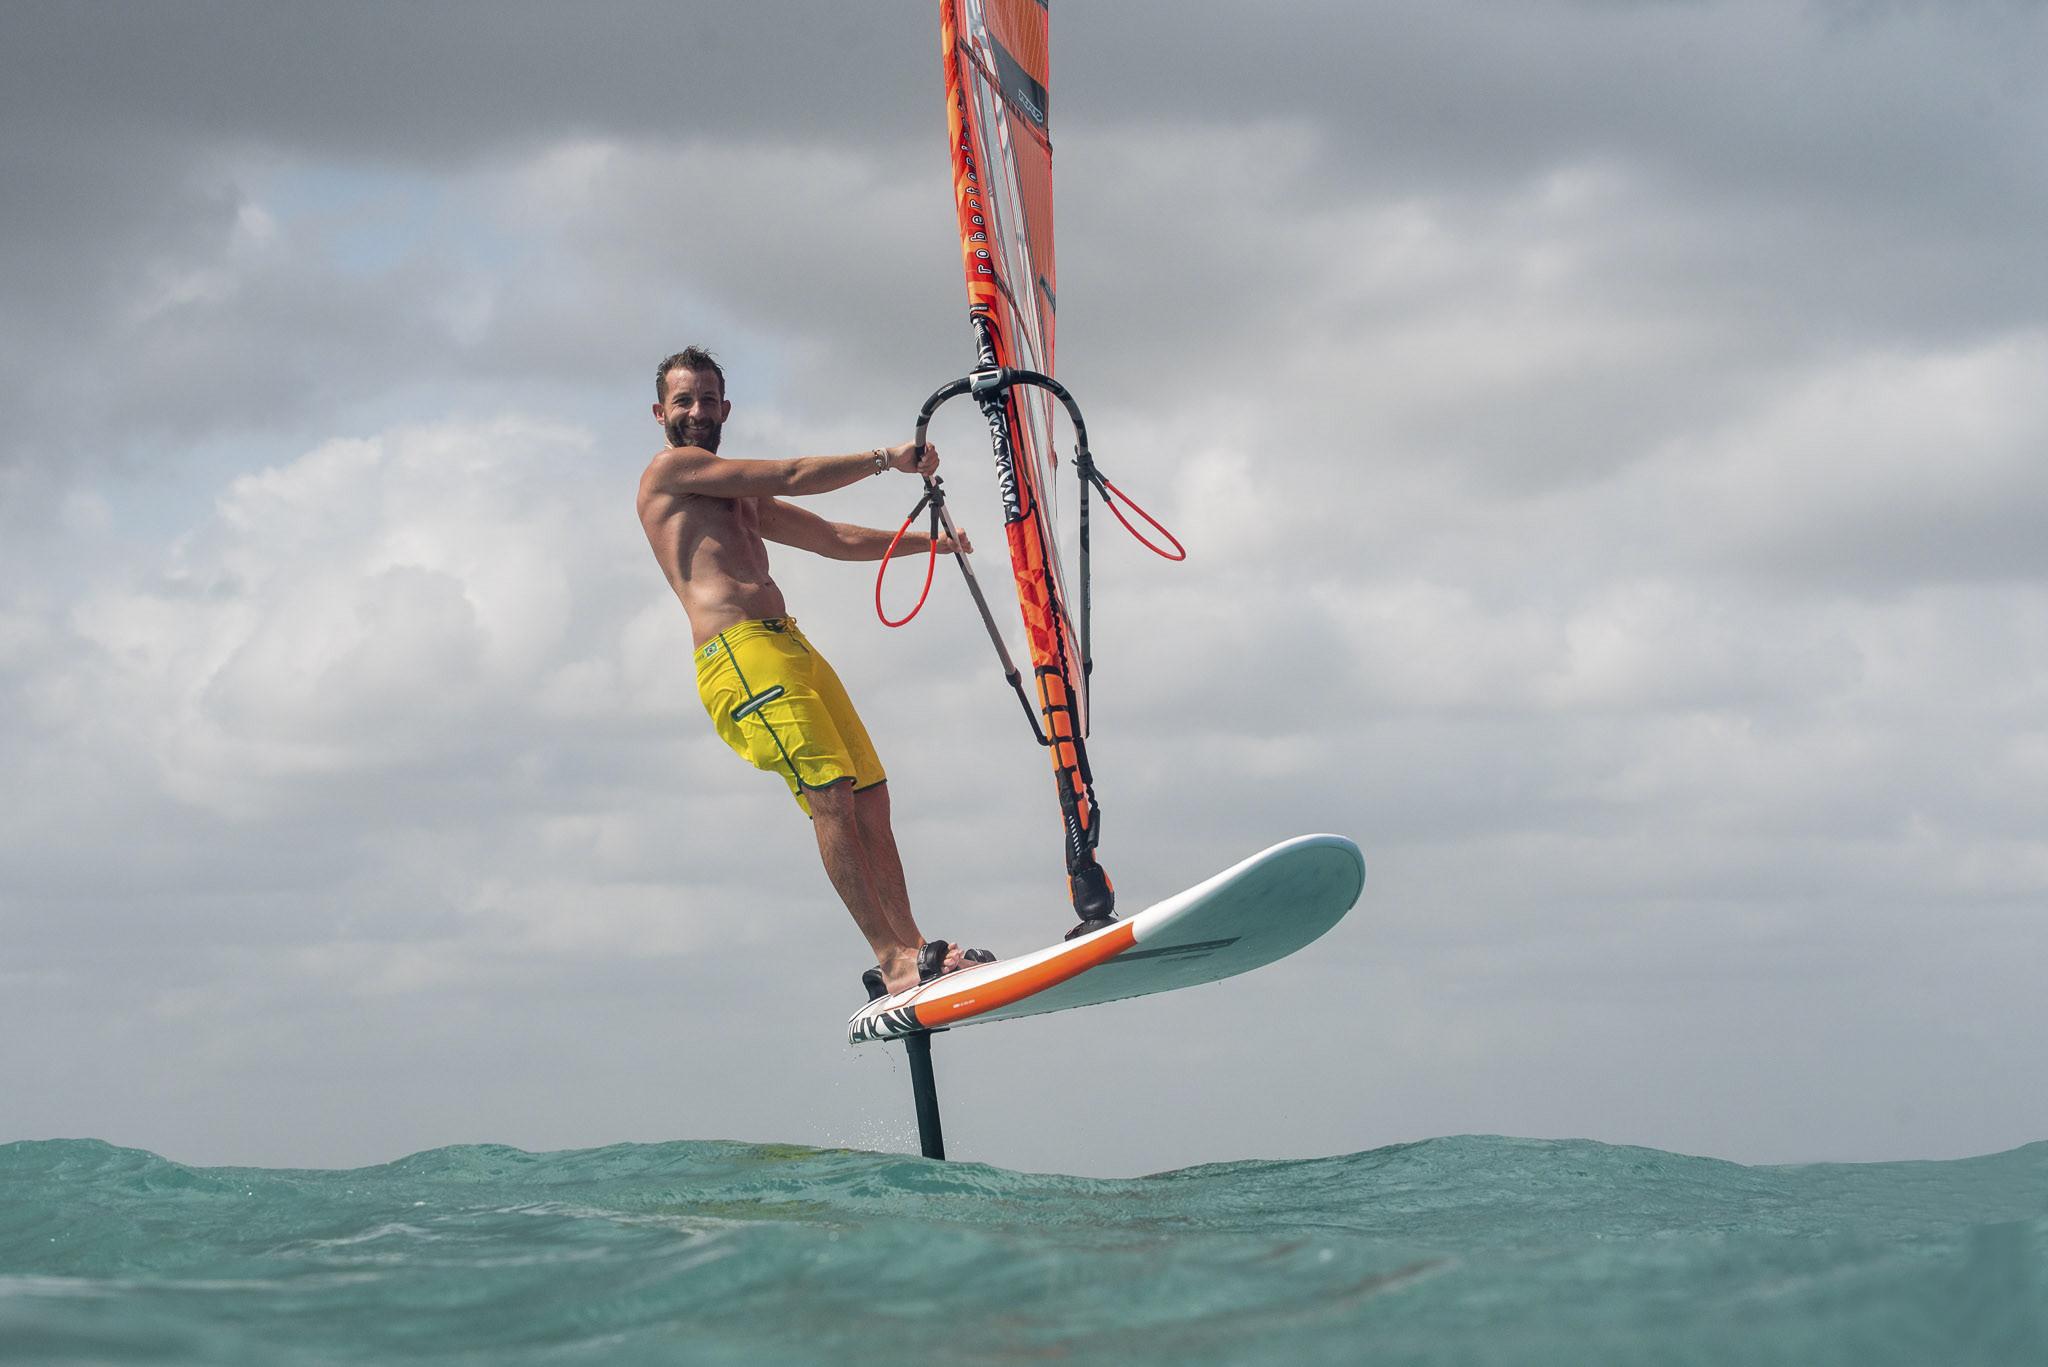 Windsurf foil Jeri250 Jericoacoara